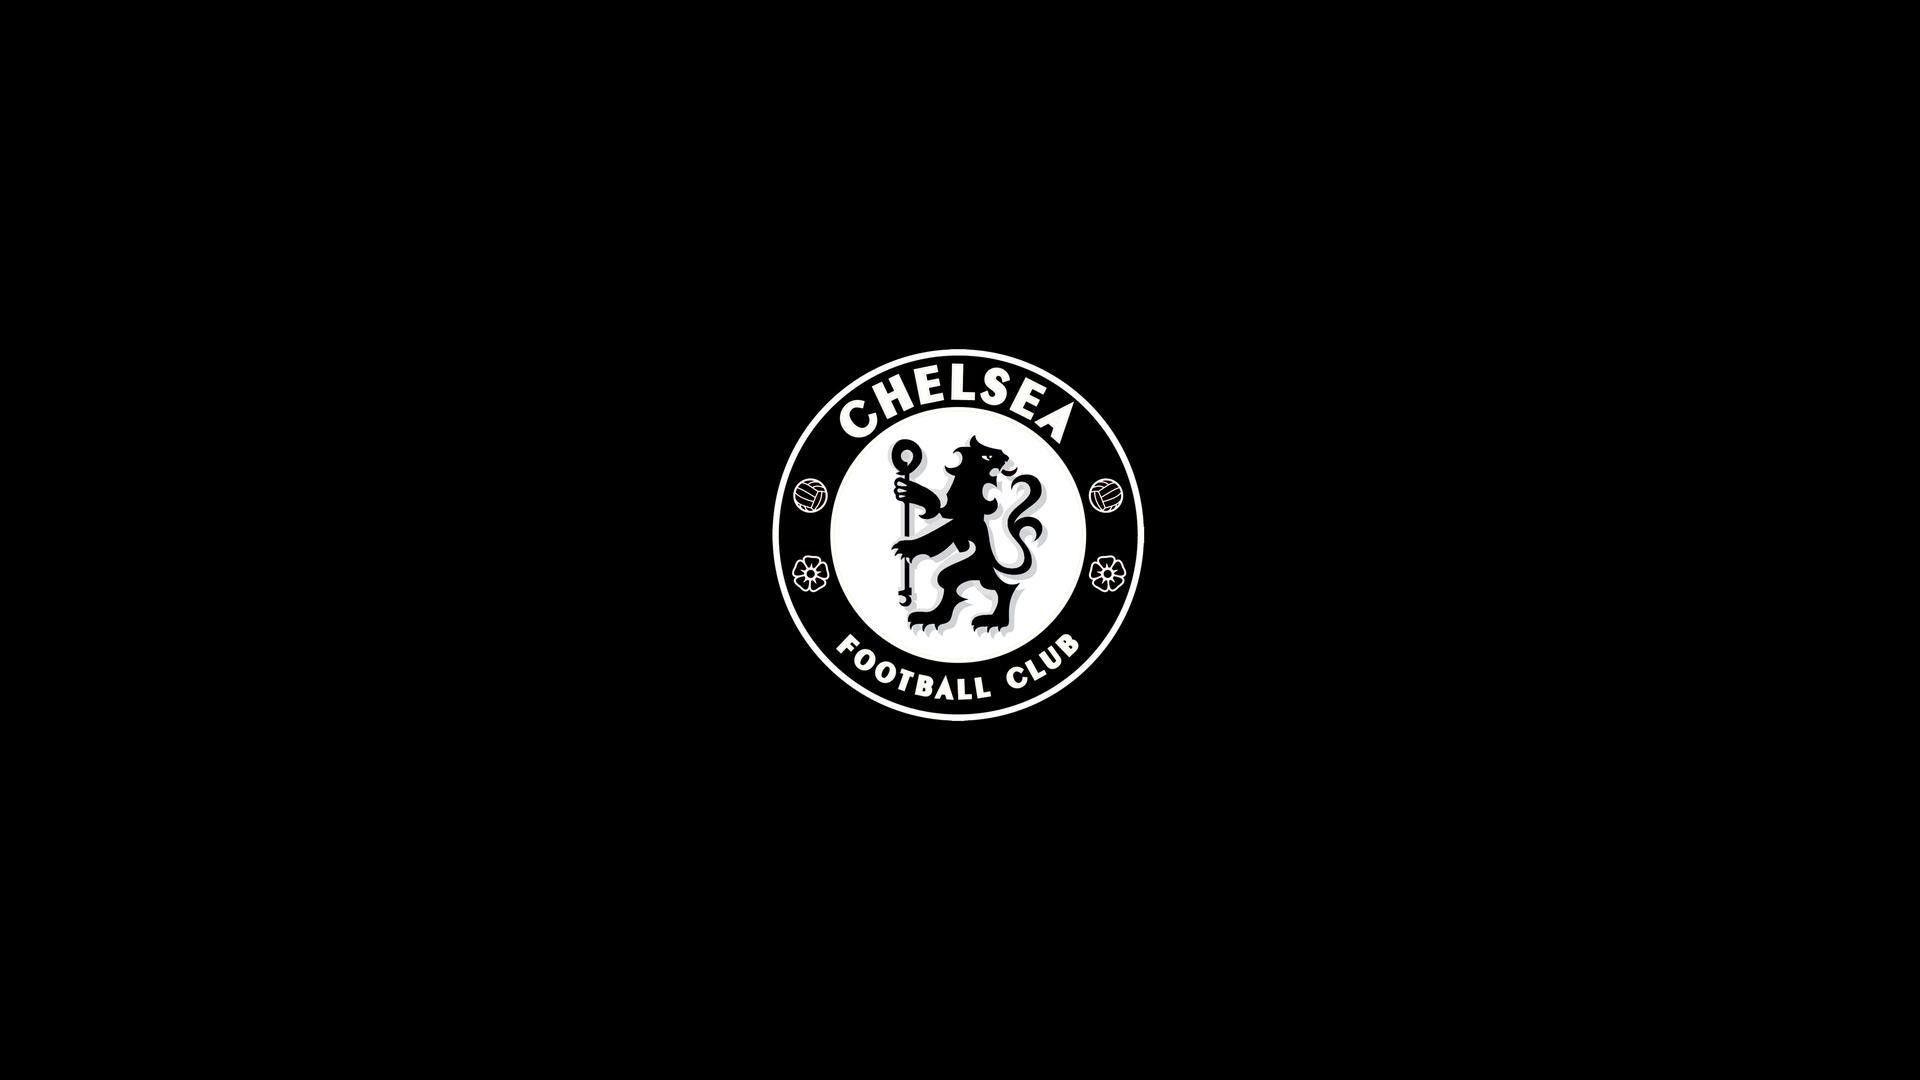 1920x1080 Chelsea Logo Black Wallpaper Hd 2016 In Soc Cer Wallpapers Hd Chelsea Logo Chelsea Wallpapers Chelsea Wallpaper